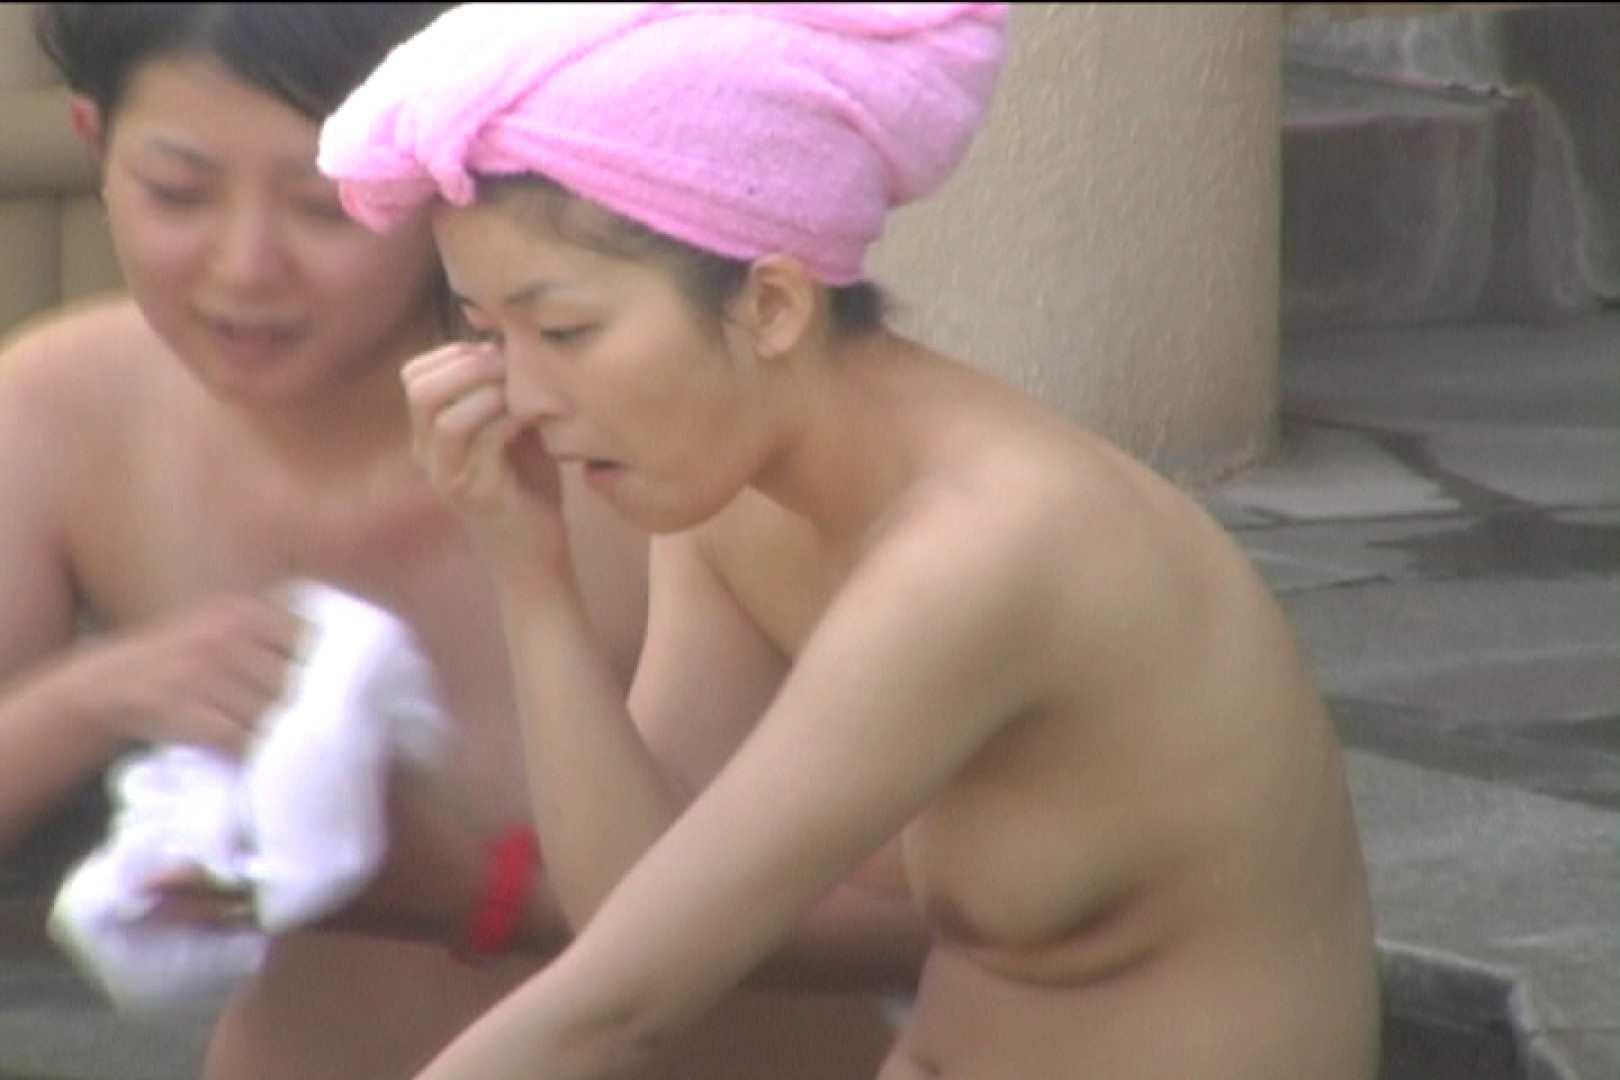 Aquaな露天風呂Vol.536 盗撮 オマンコ無修正動画無料 94連発 92